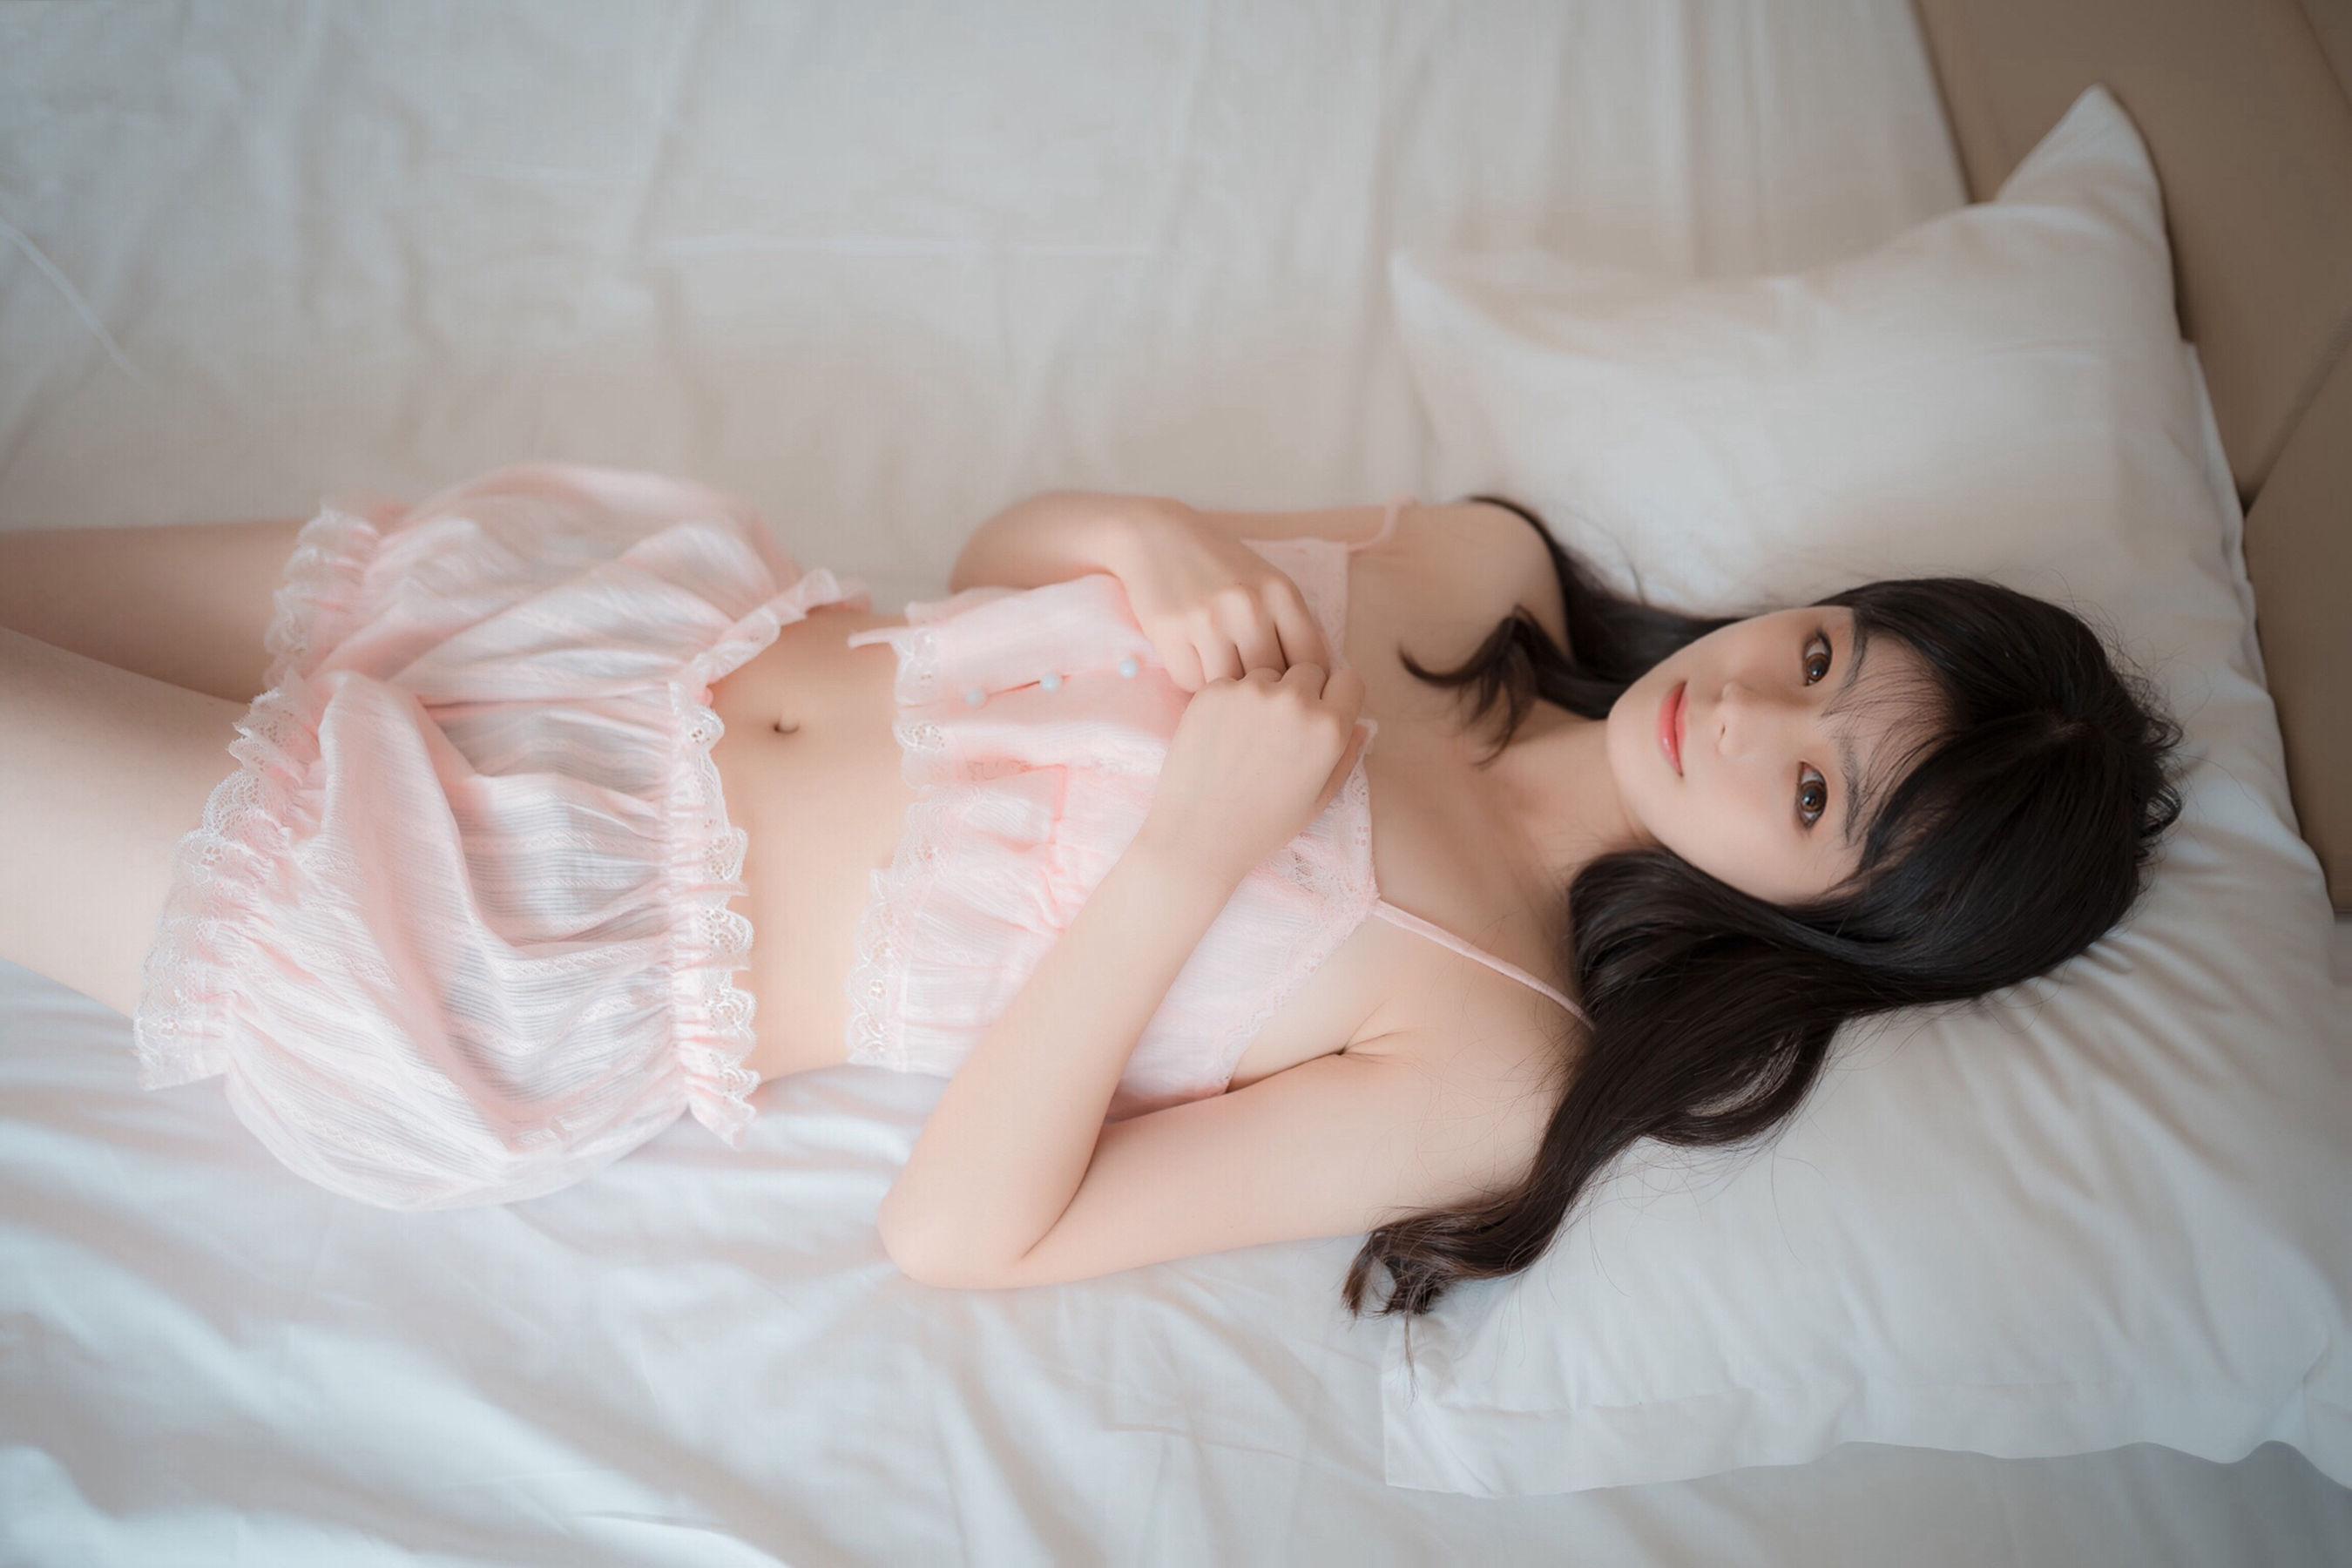 梦幻少女 Dream Girl